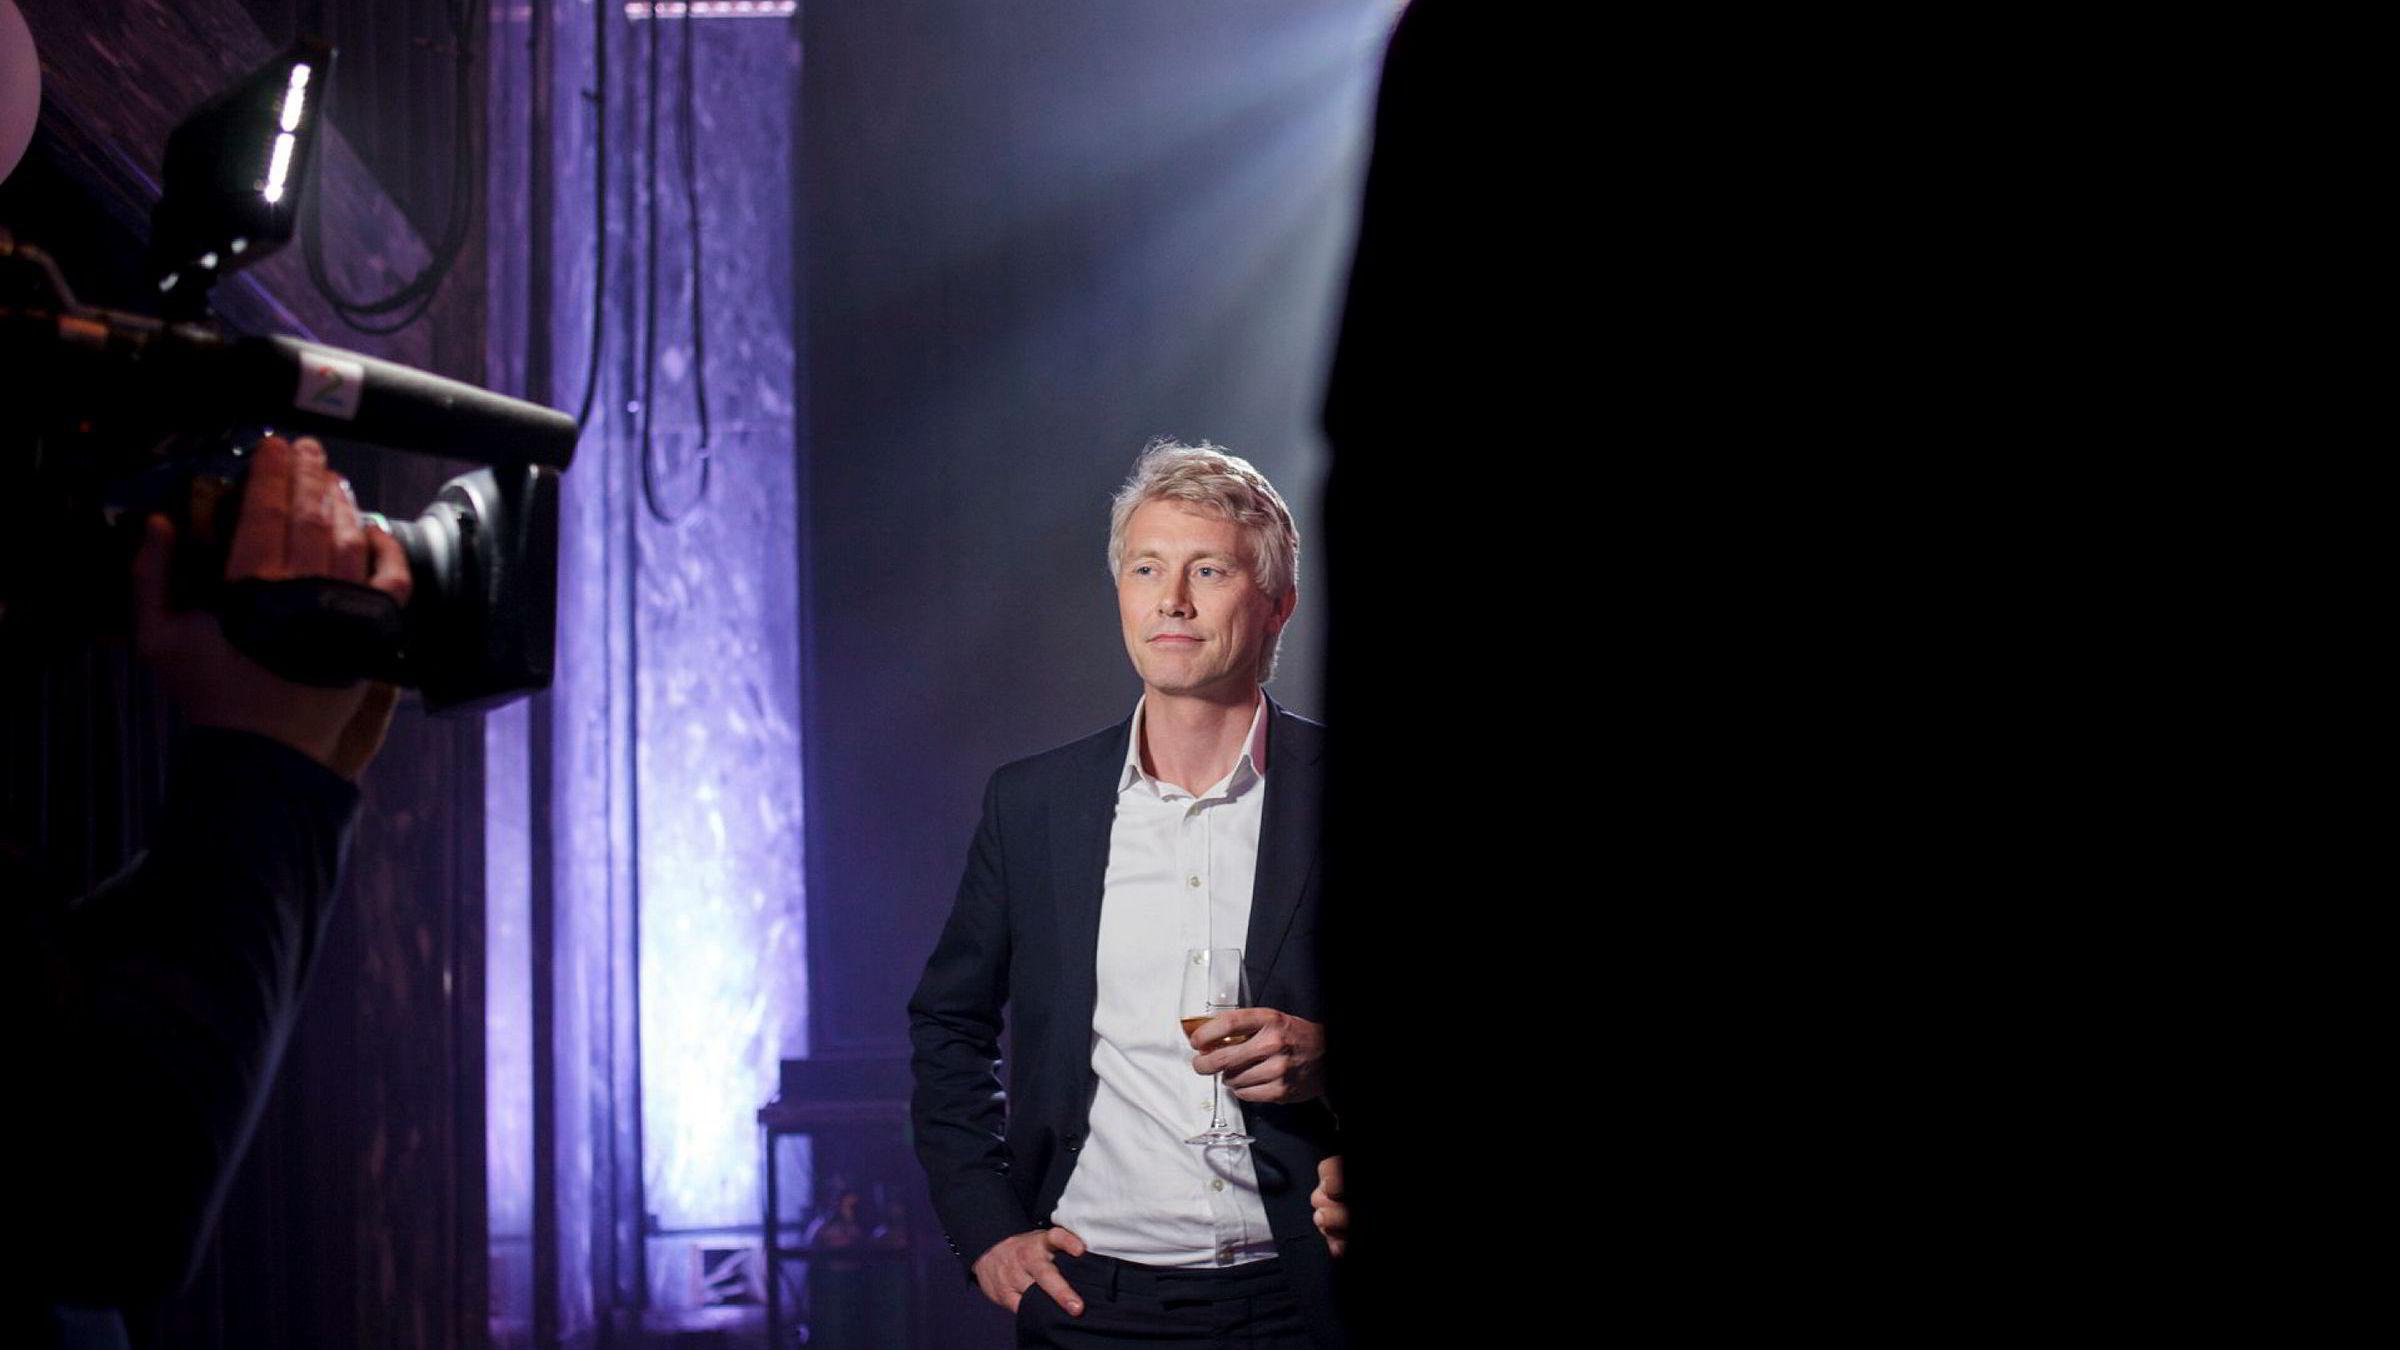 TV 2-sjef Olav Sandnes feiret torsdag suksessen til TV 2 Nyhetskanalen i en ellers tøff tid for mediehuset. Foto: Javad Parsa